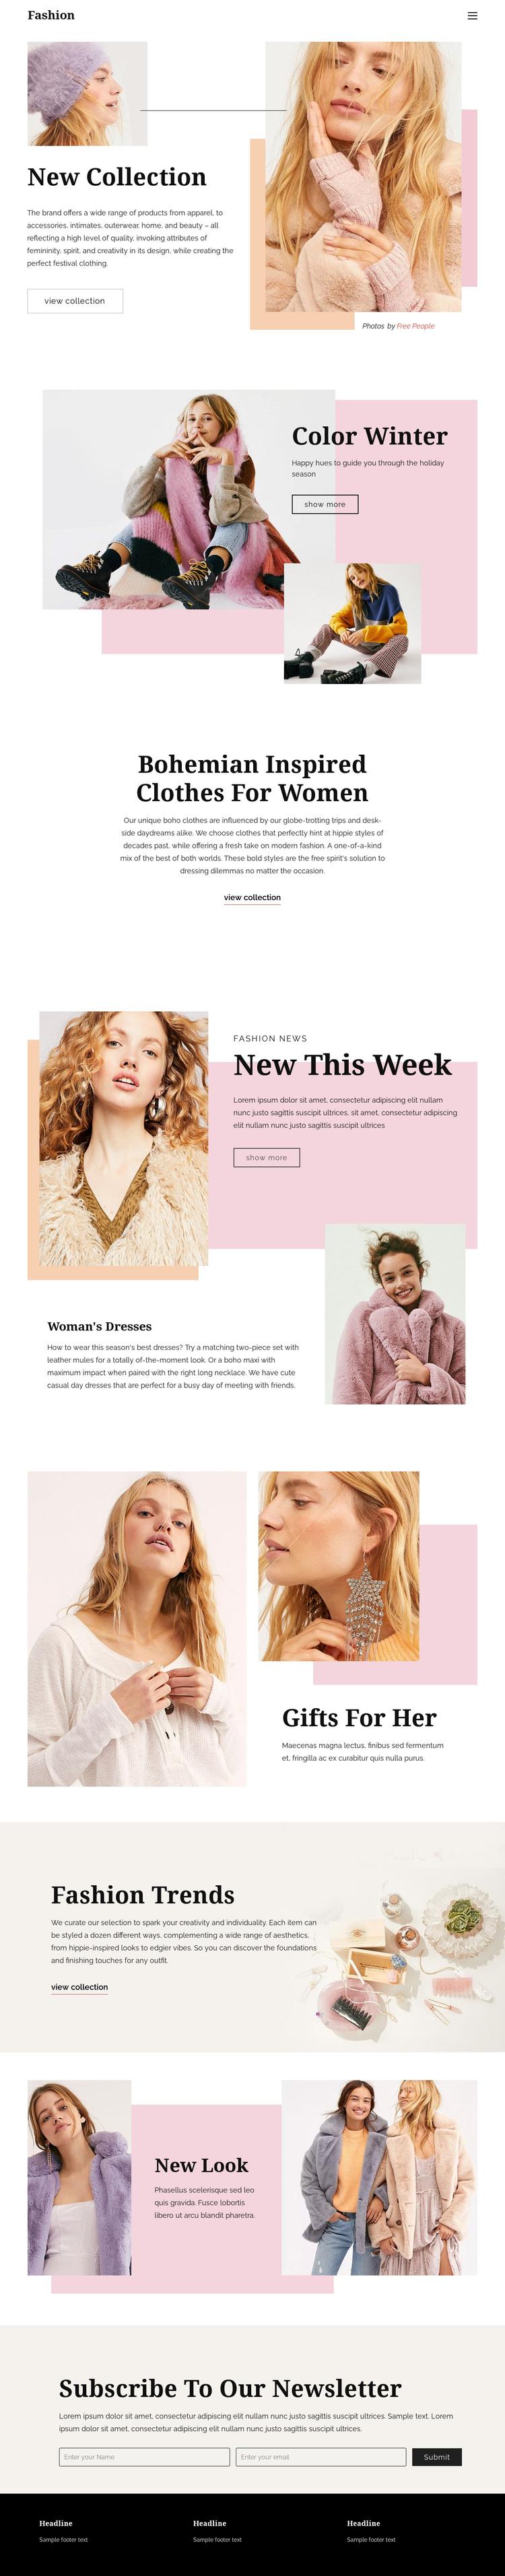 Fashion Page Design Joomla Page Builder